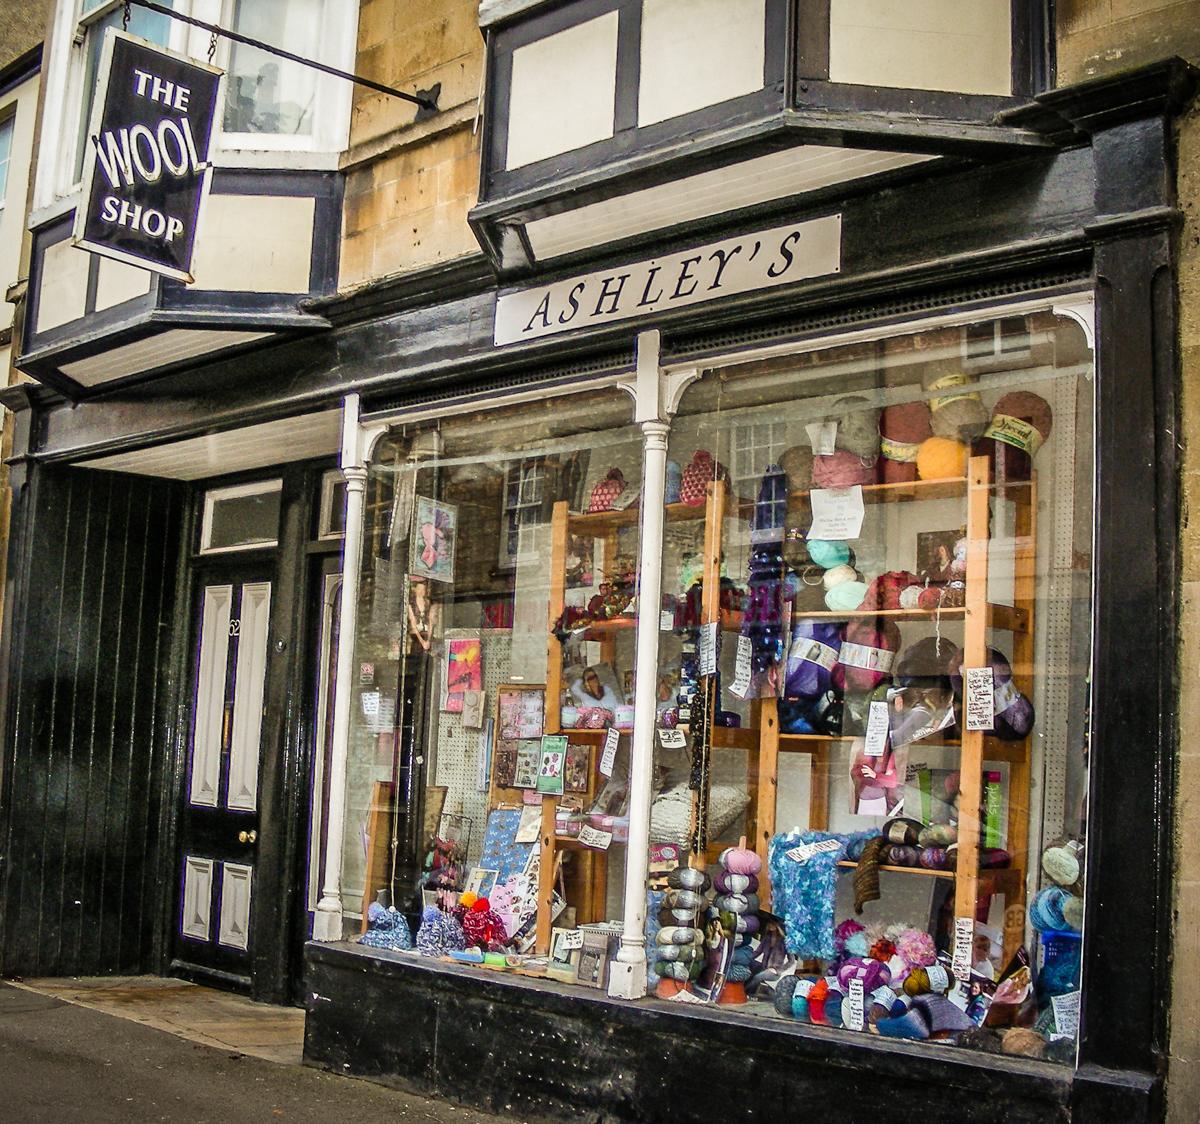 Ashley's The Wool Shop